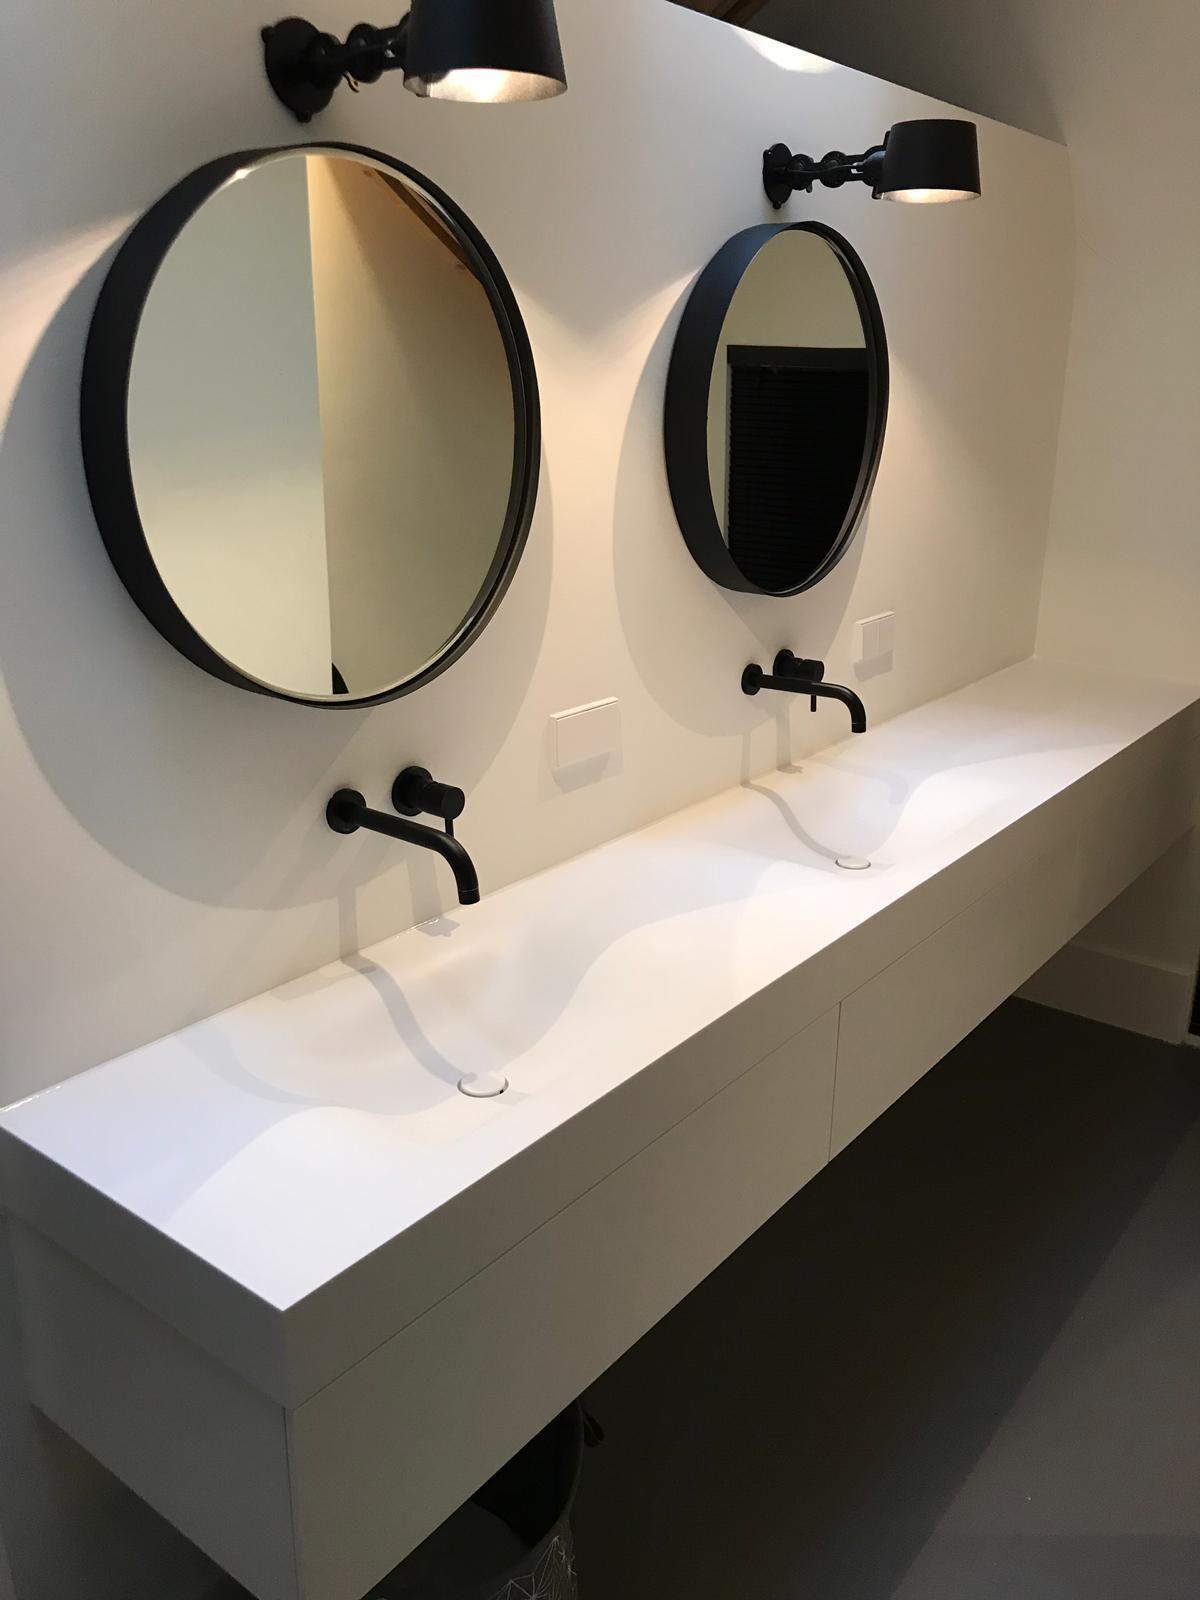 Tiz Design Kwaliteits Badkamermeubels Solid Surface Badkamer Spiegel Badkamer Badkamermeubel